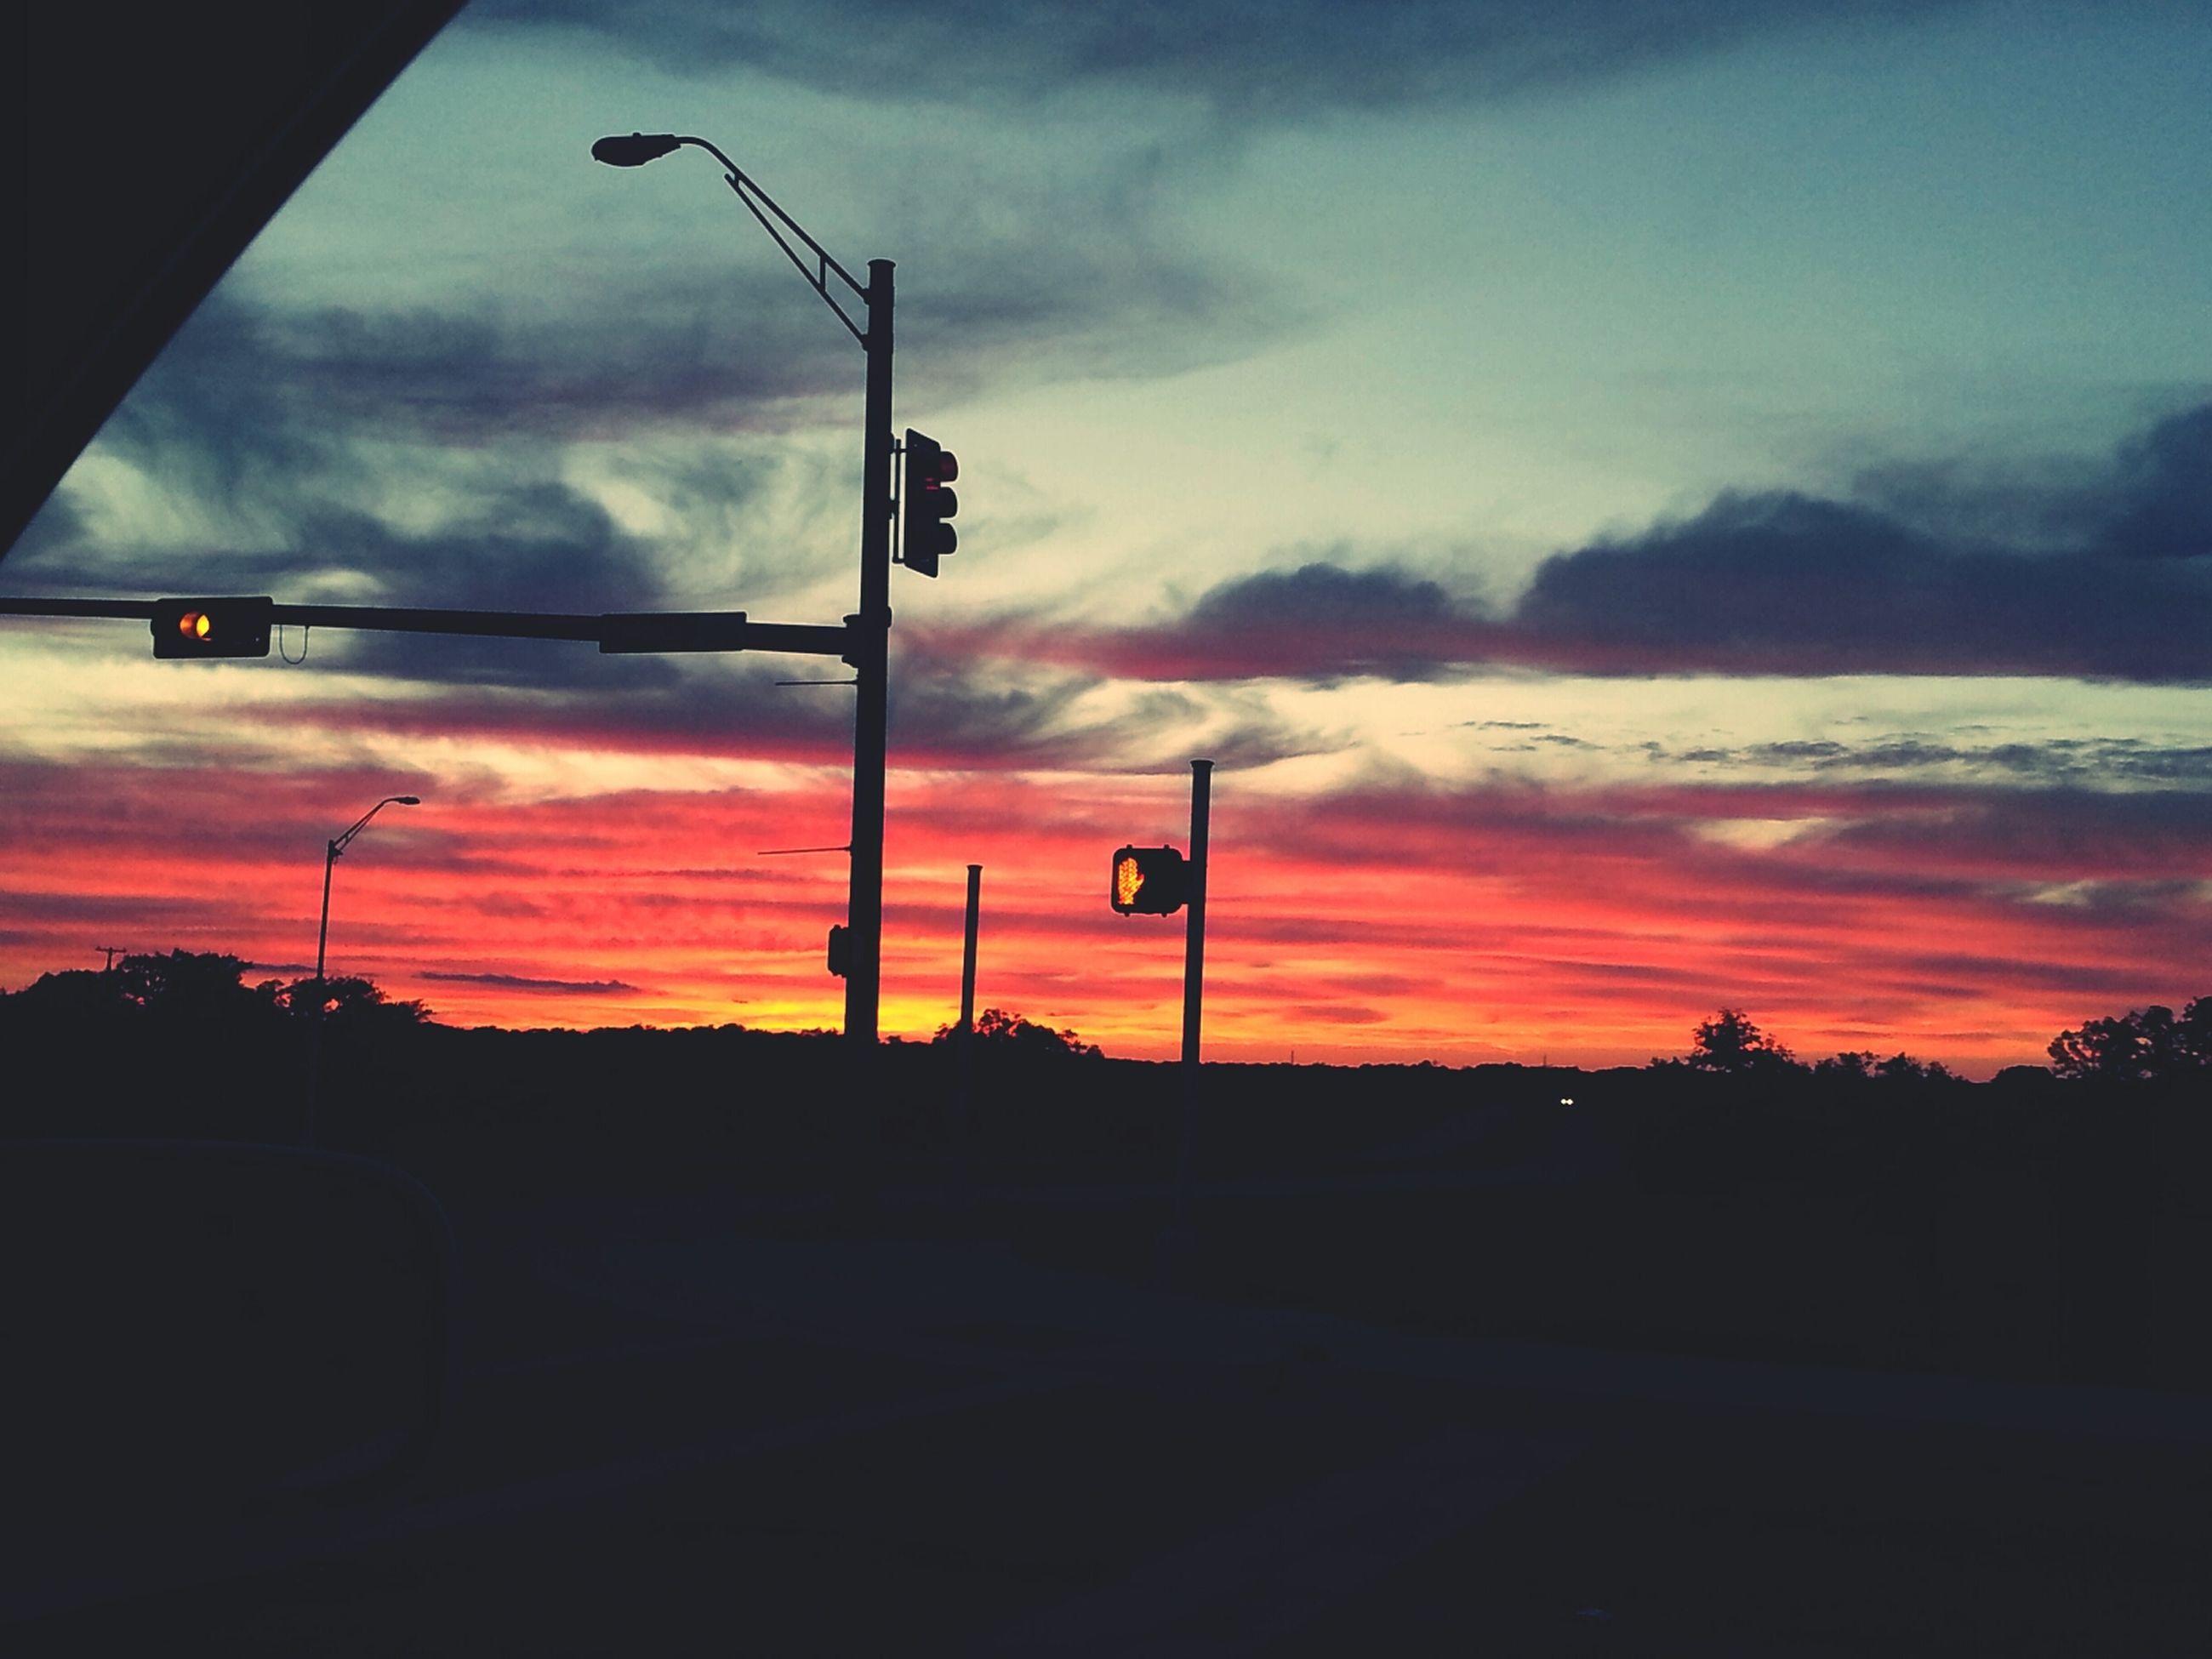 sunset, sky, silhouette, transportation, orange color, cloud - sky, street light, road, car, cloud, land vehicle, dramatic sky, cloudy, dark, mode of transport, scenics, dusk, beauty in nature, street, nature